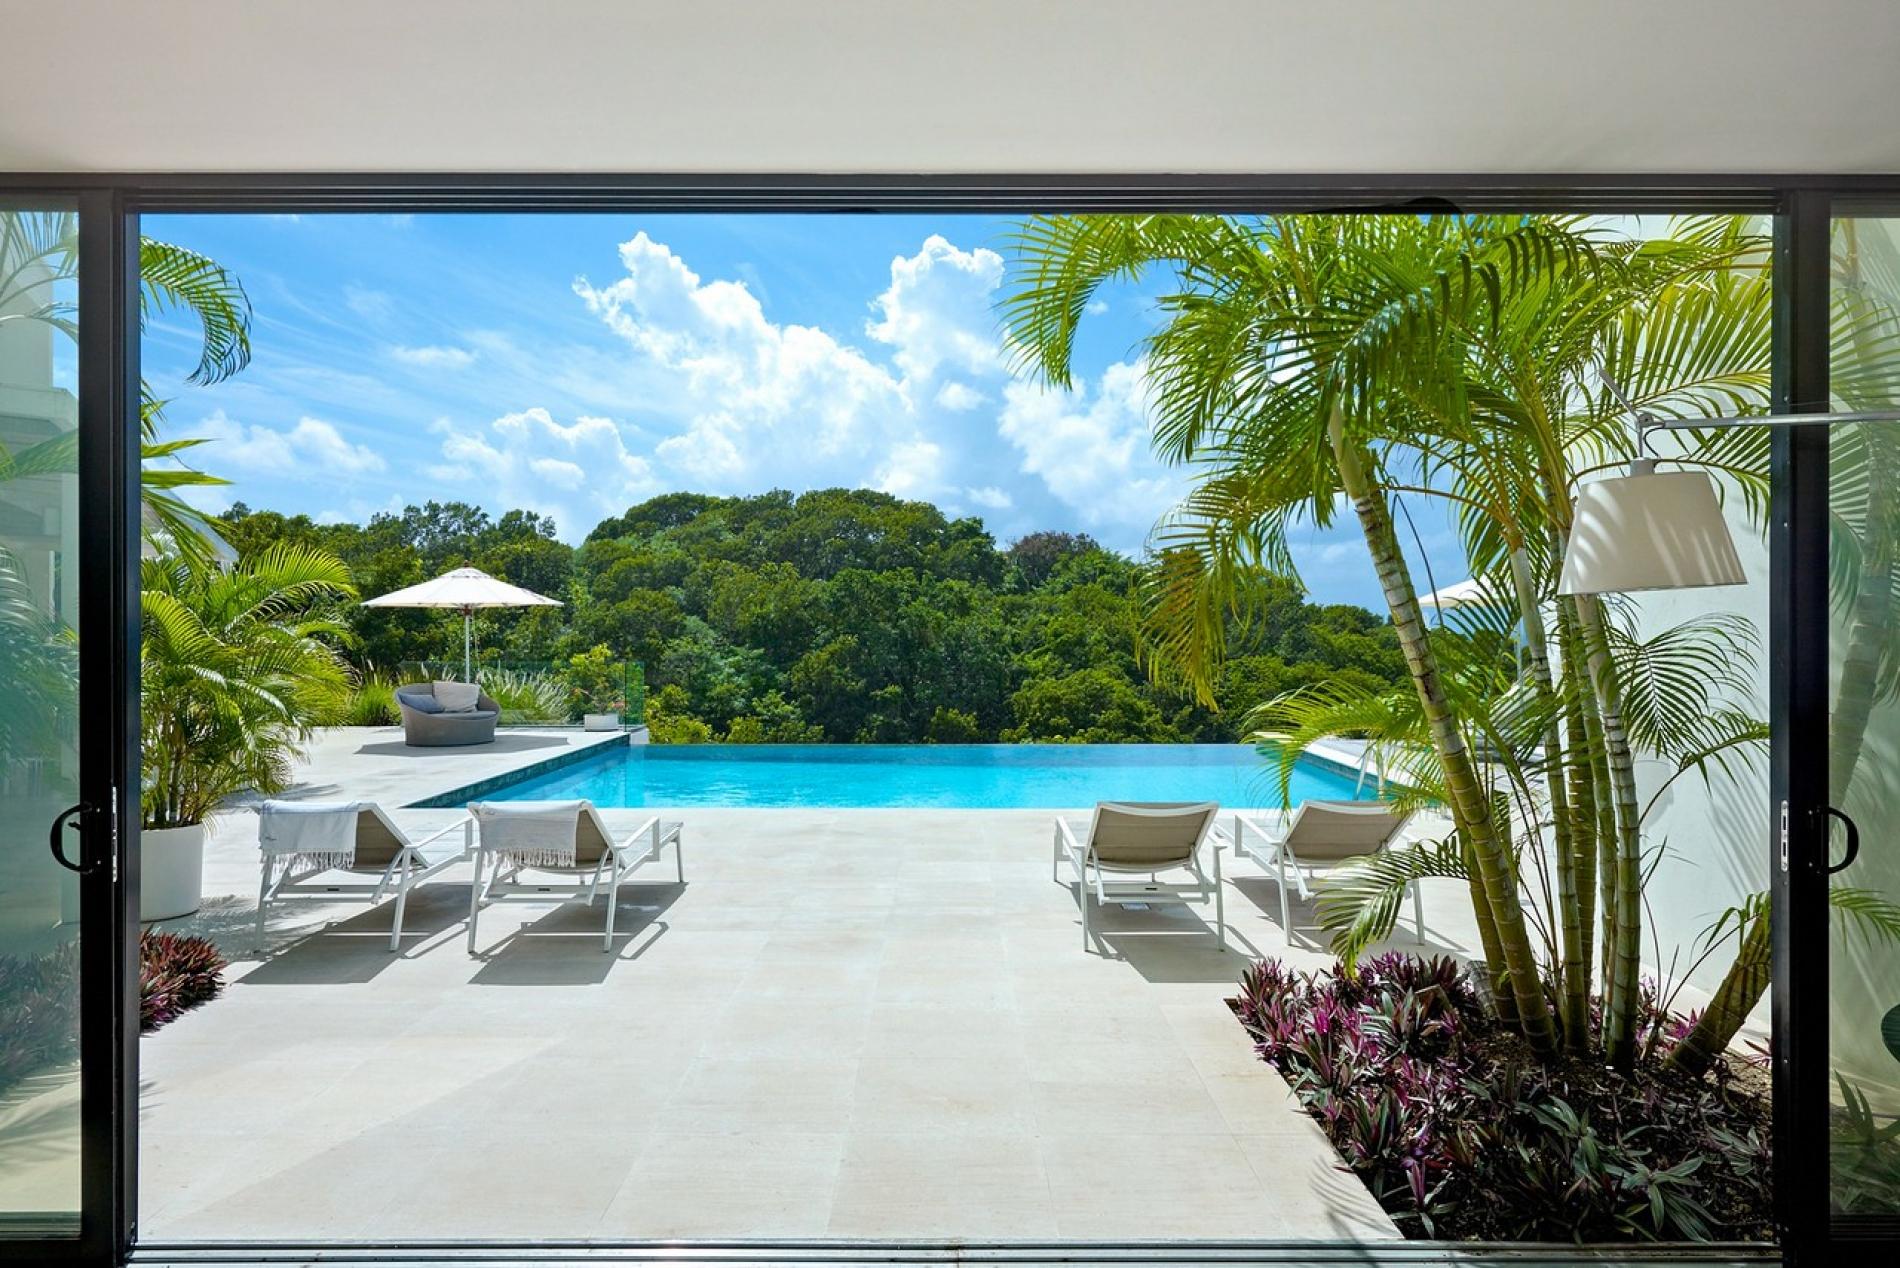 Atelier exquisite luxury villa 4 bedrooms for 18 carlton house terrace in st james